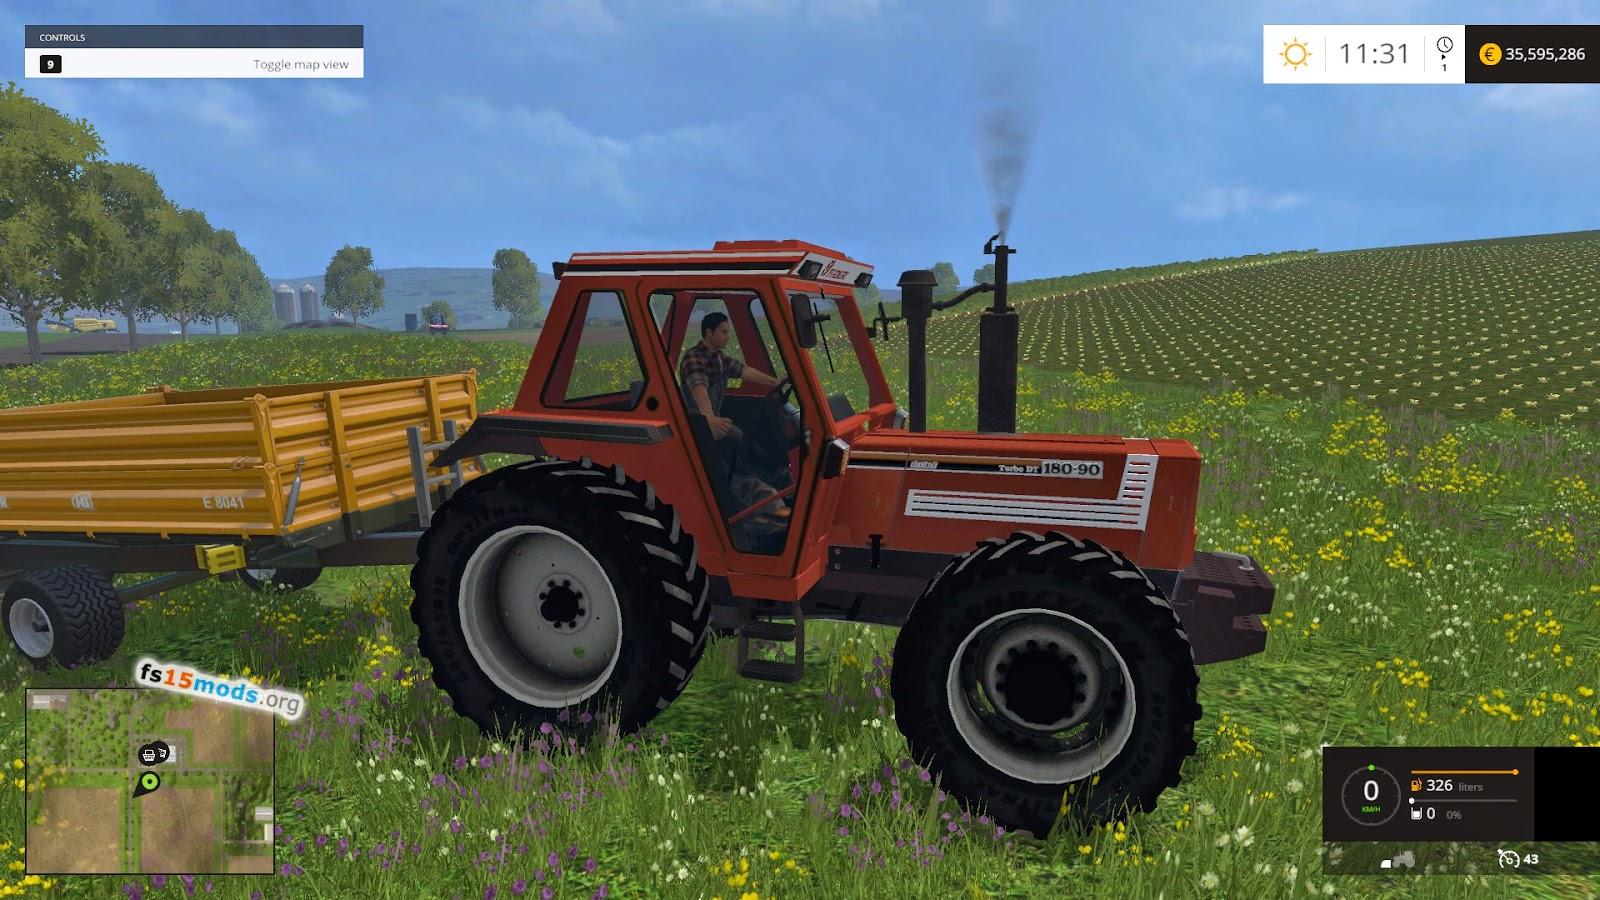 Fiatagri 180 90 Tractor Fs15 Mods